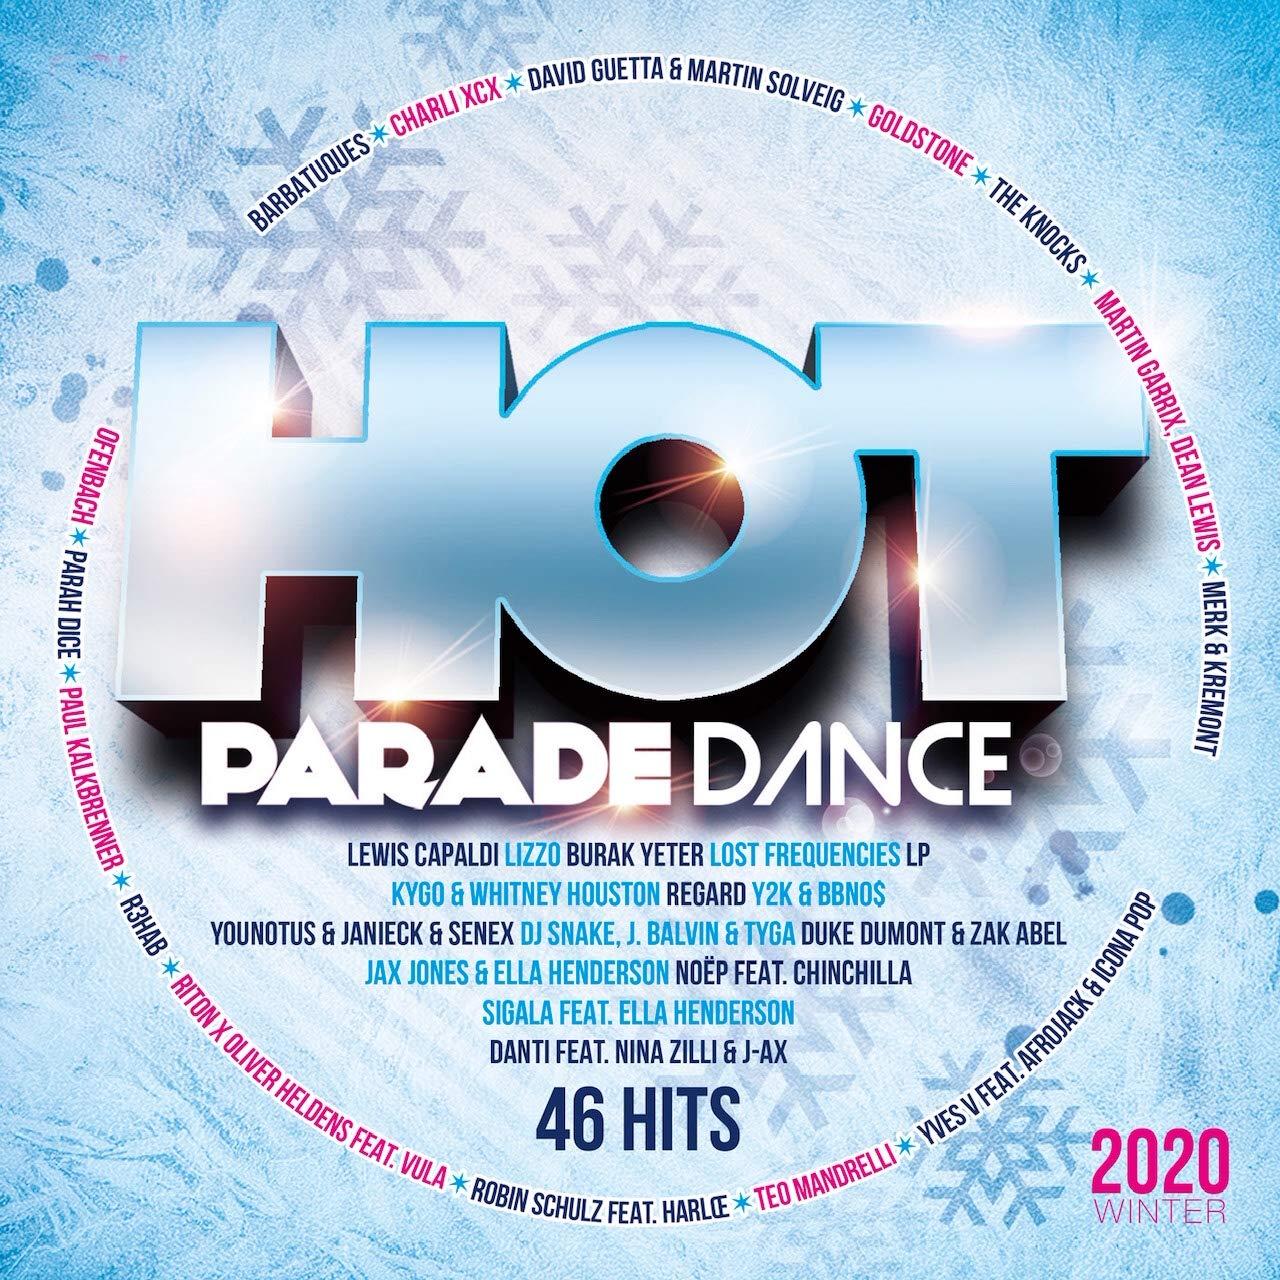 HOT PARADE DANCE WINTER 2020 (2CD) (CD)